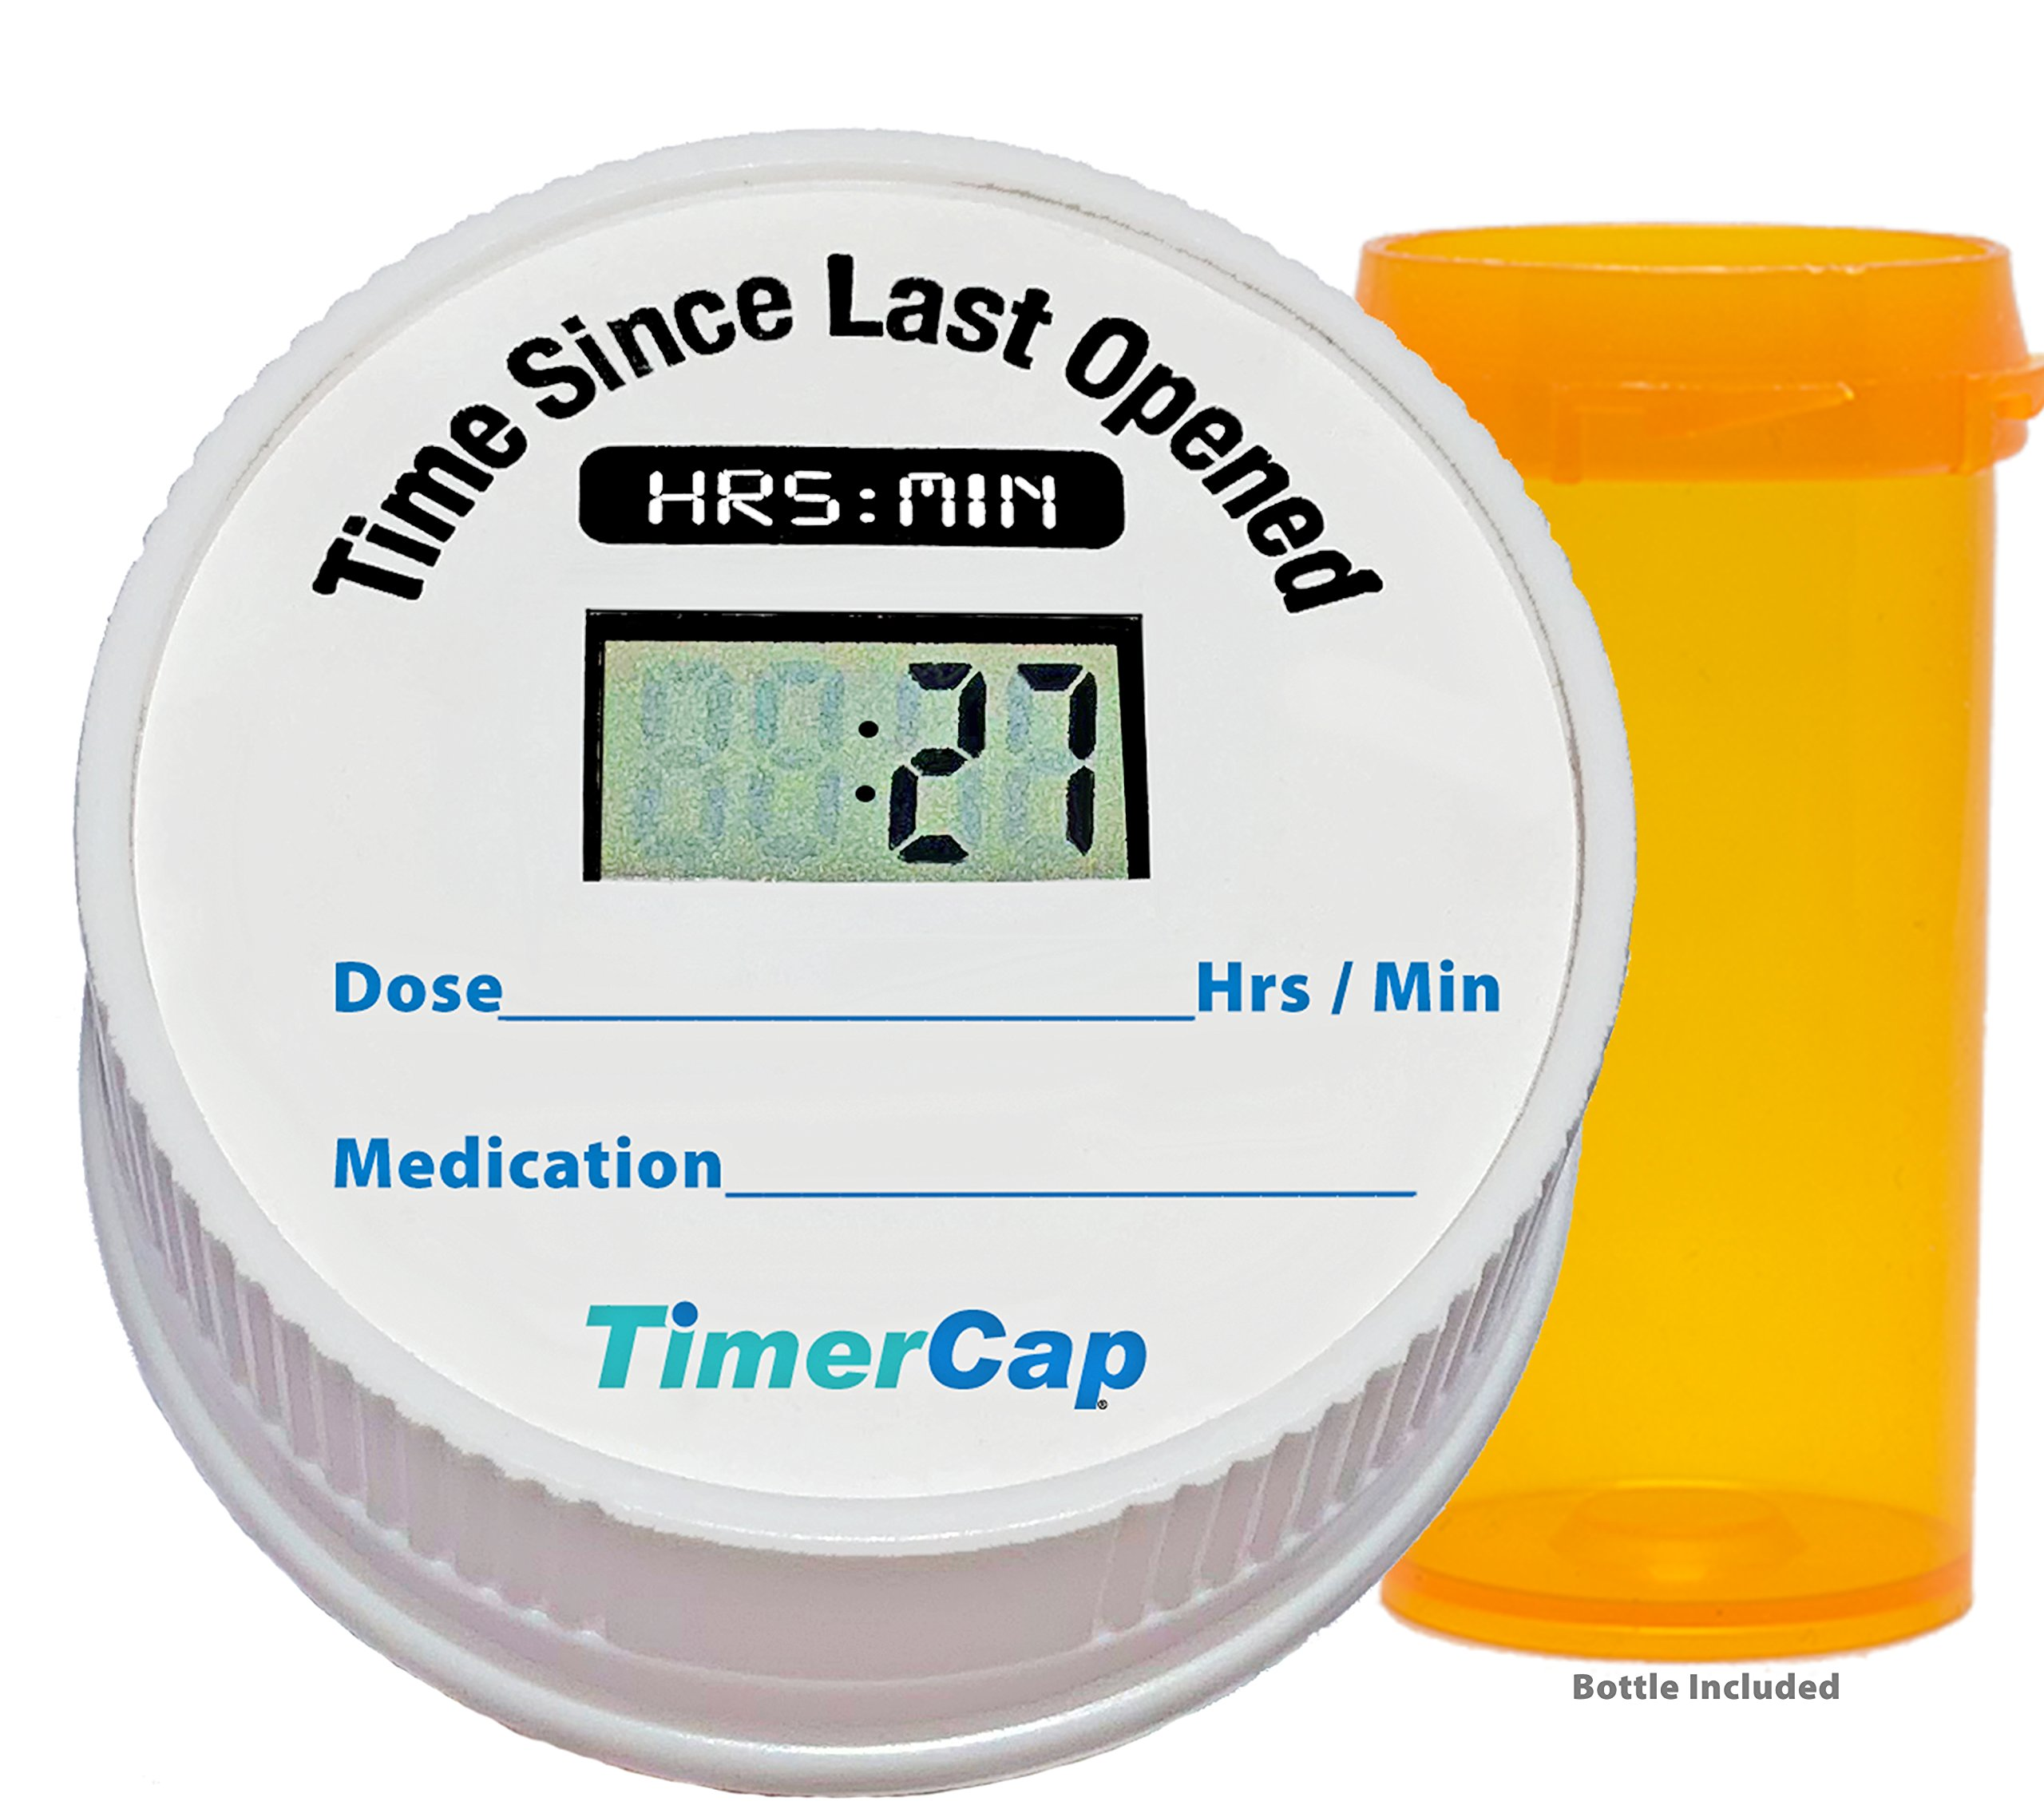 TimerCap Pill Organizer Bottle Cap Automatically Records Built-in Stopwatch   Medicine Planner (4 Pack, Standard)